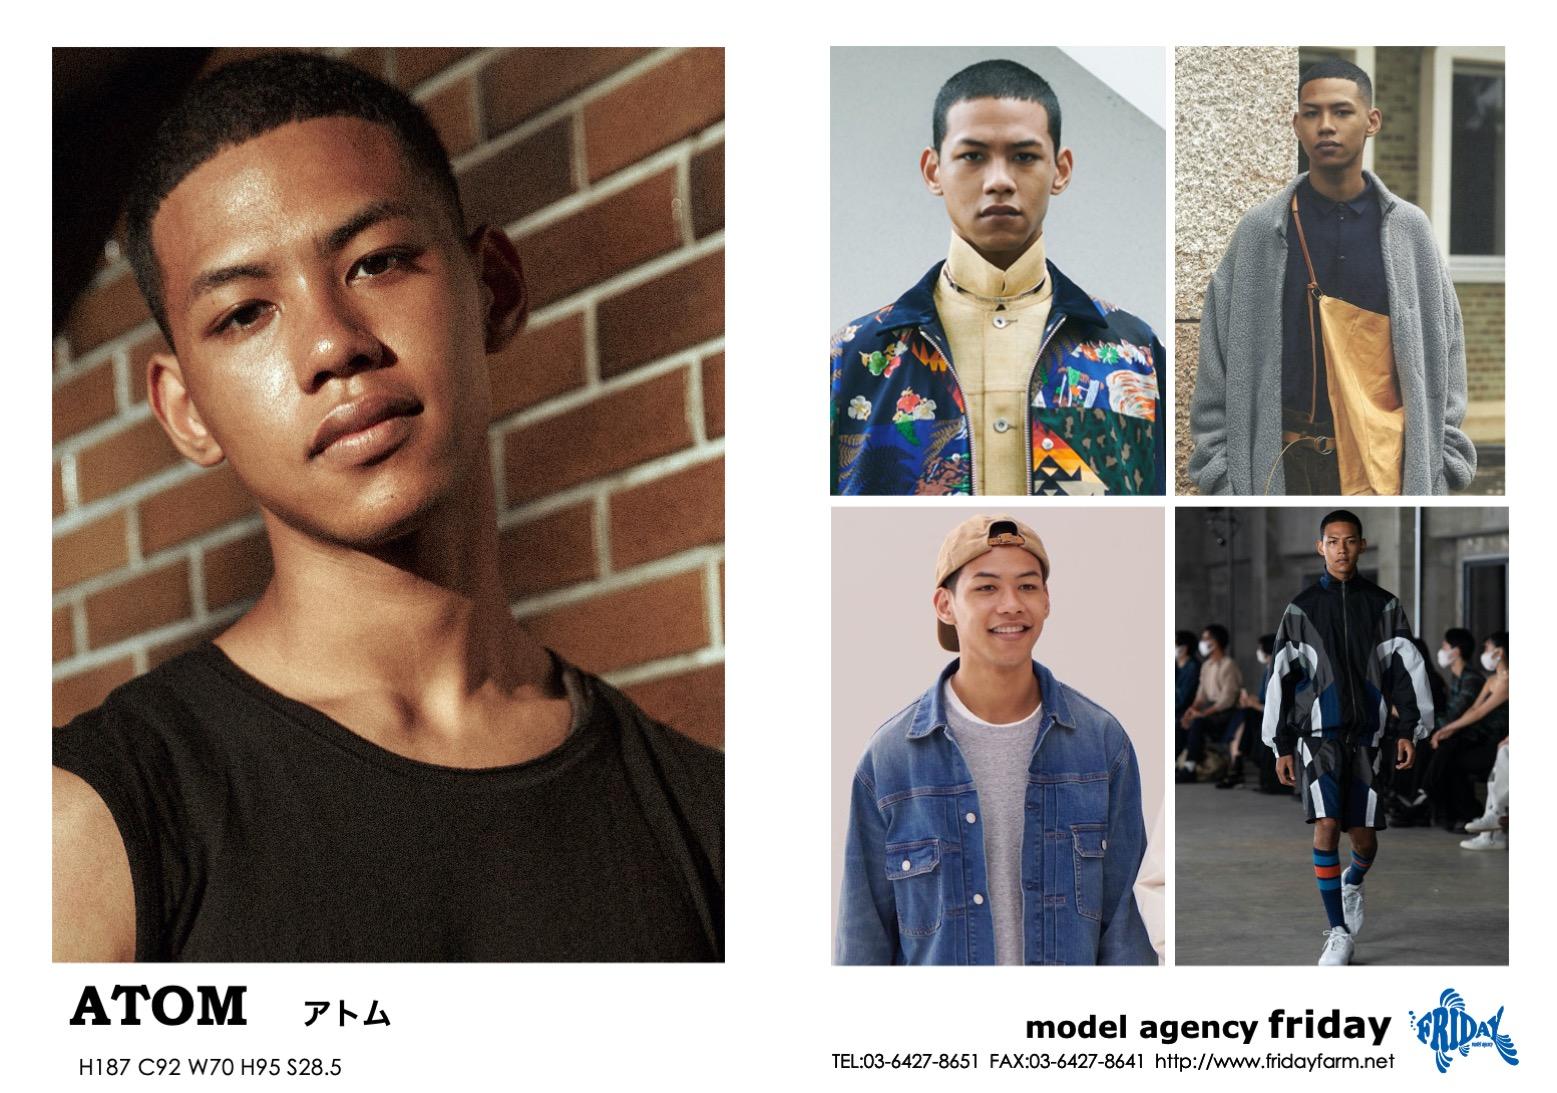 ATOM - アトム   model agency friday